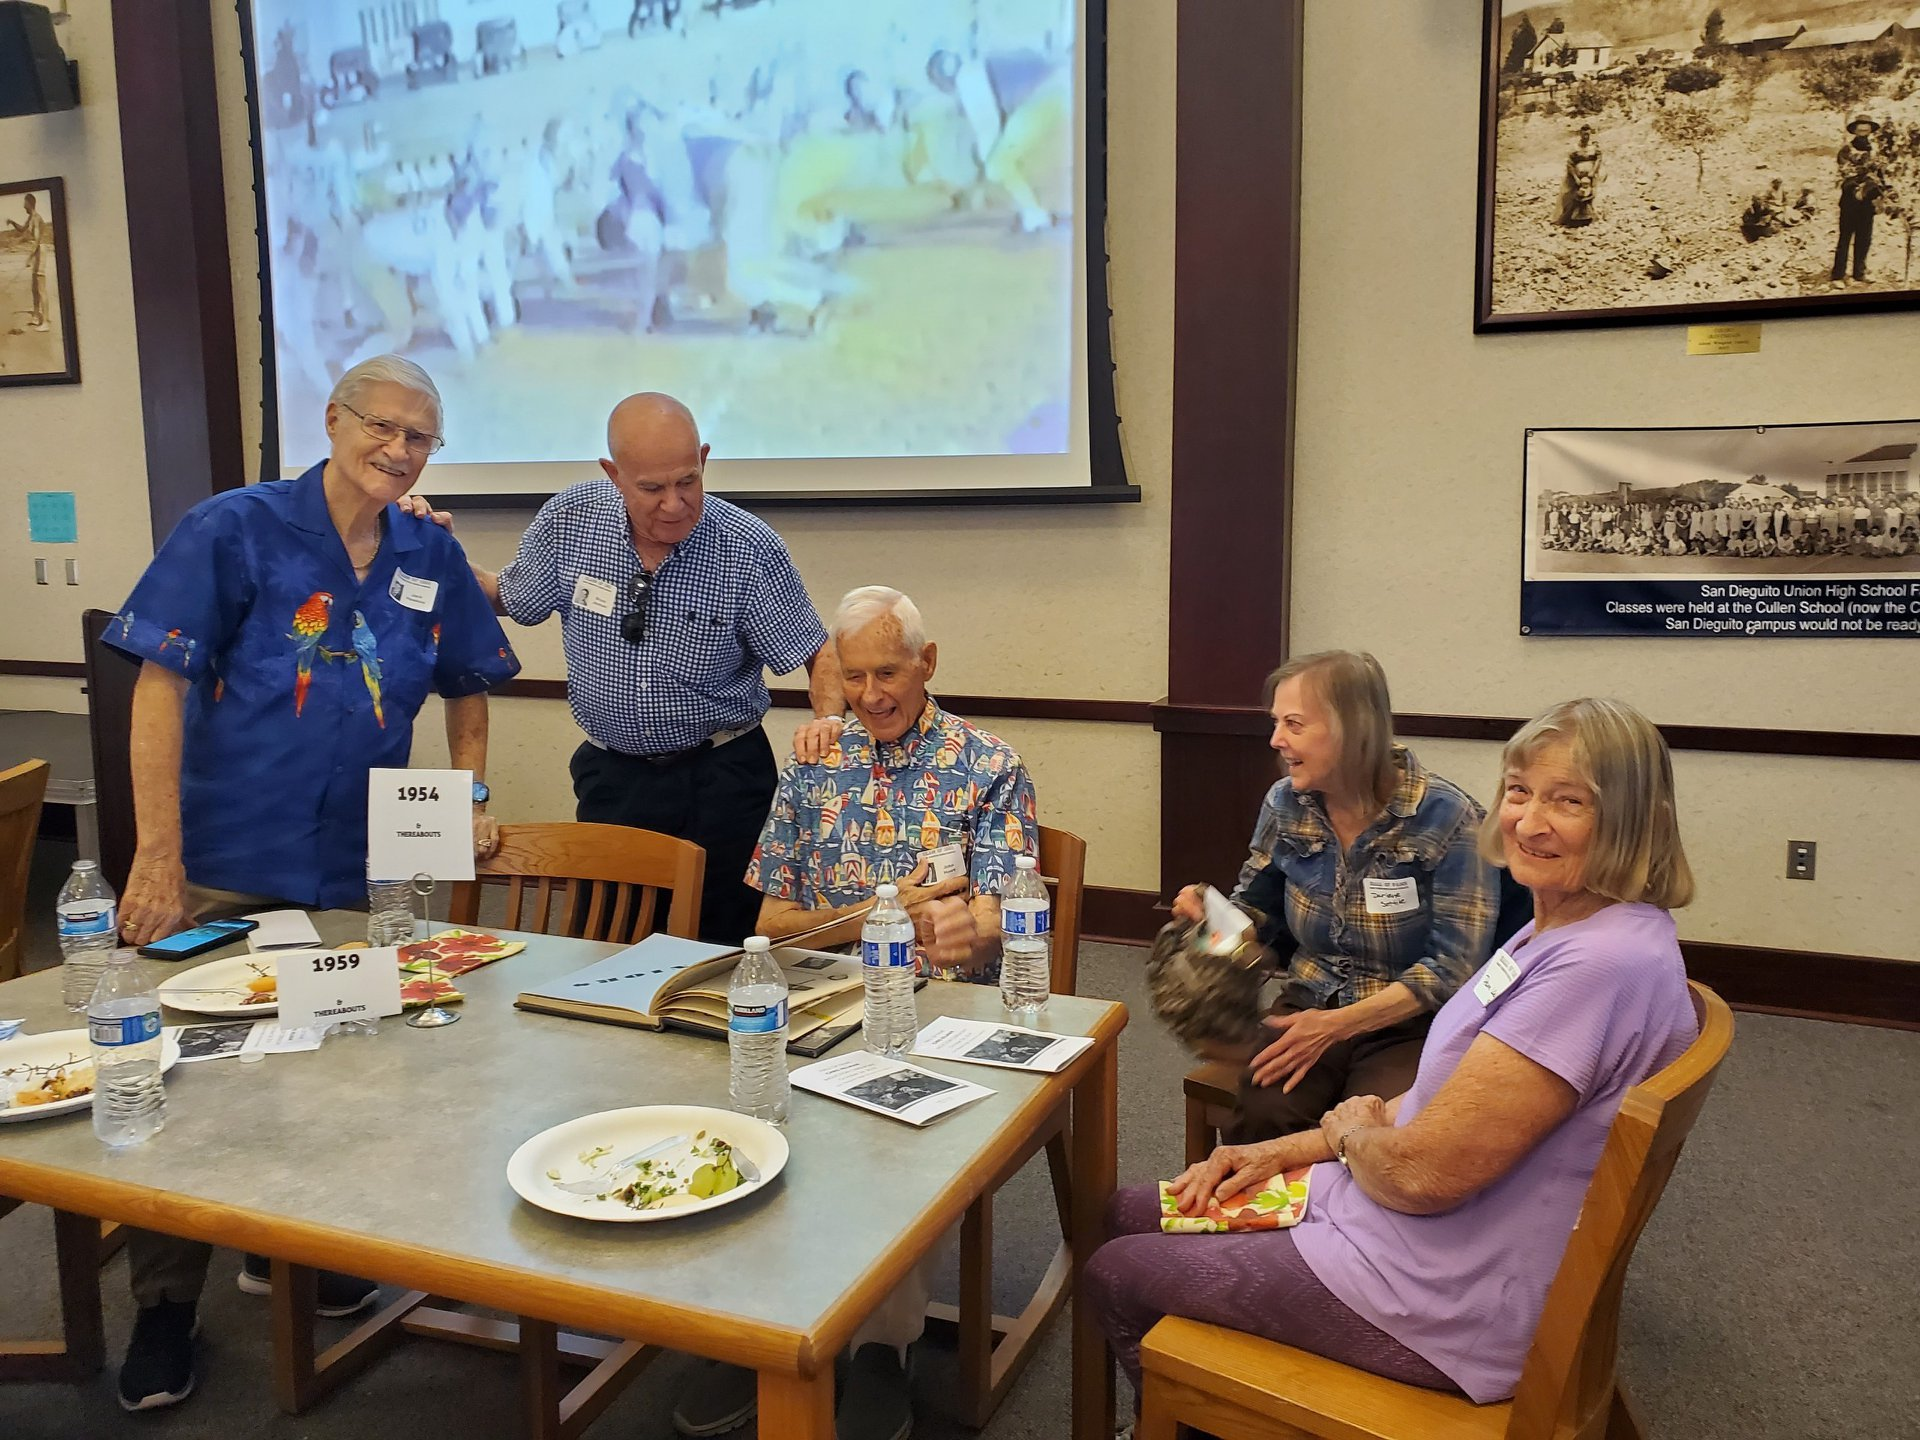 Alumni chat at table